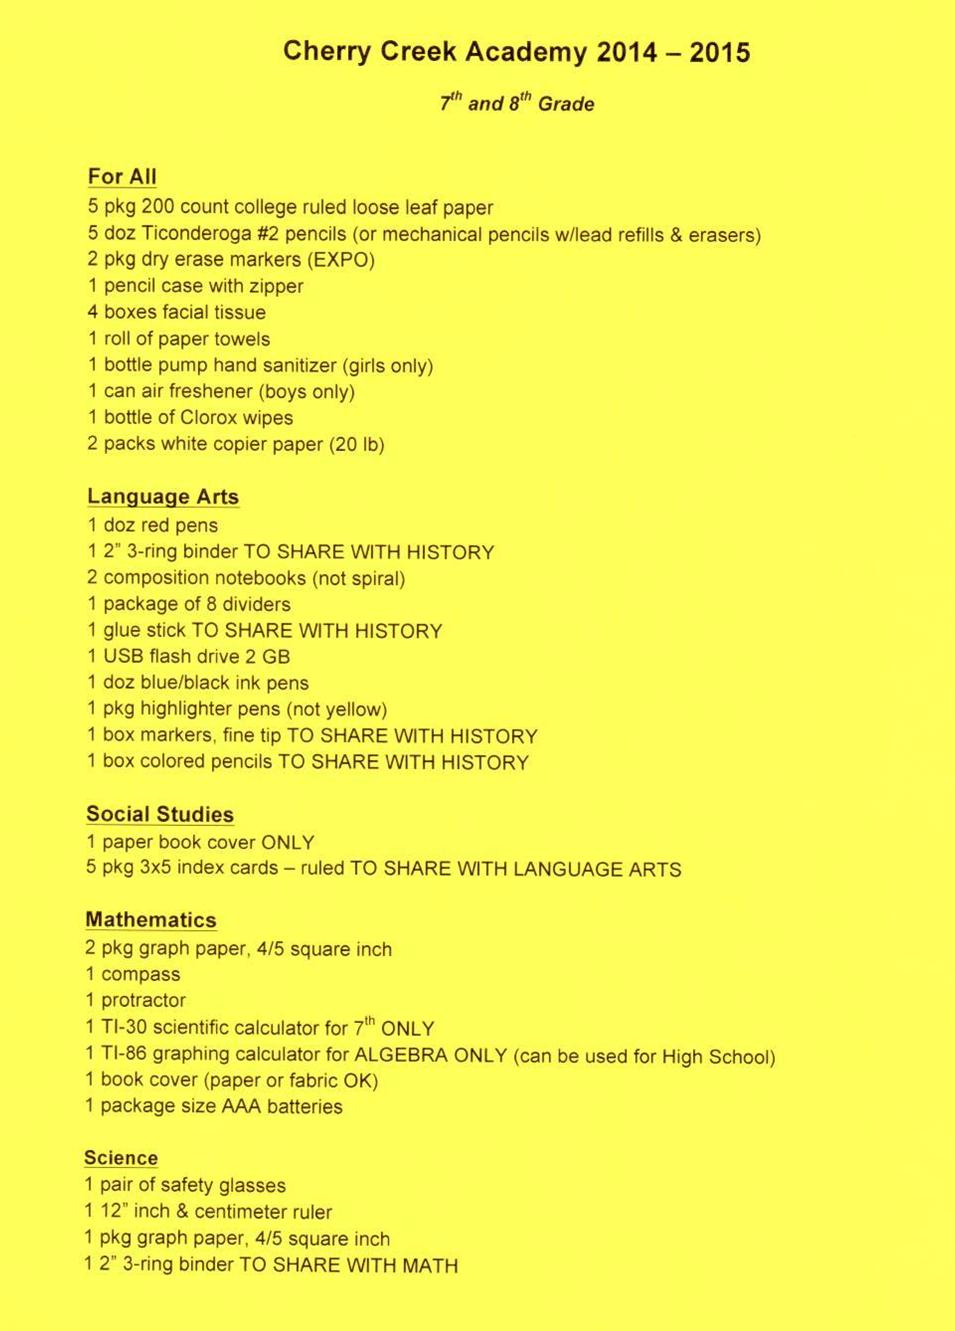 Cherry Creek Academy School Supply List 2014